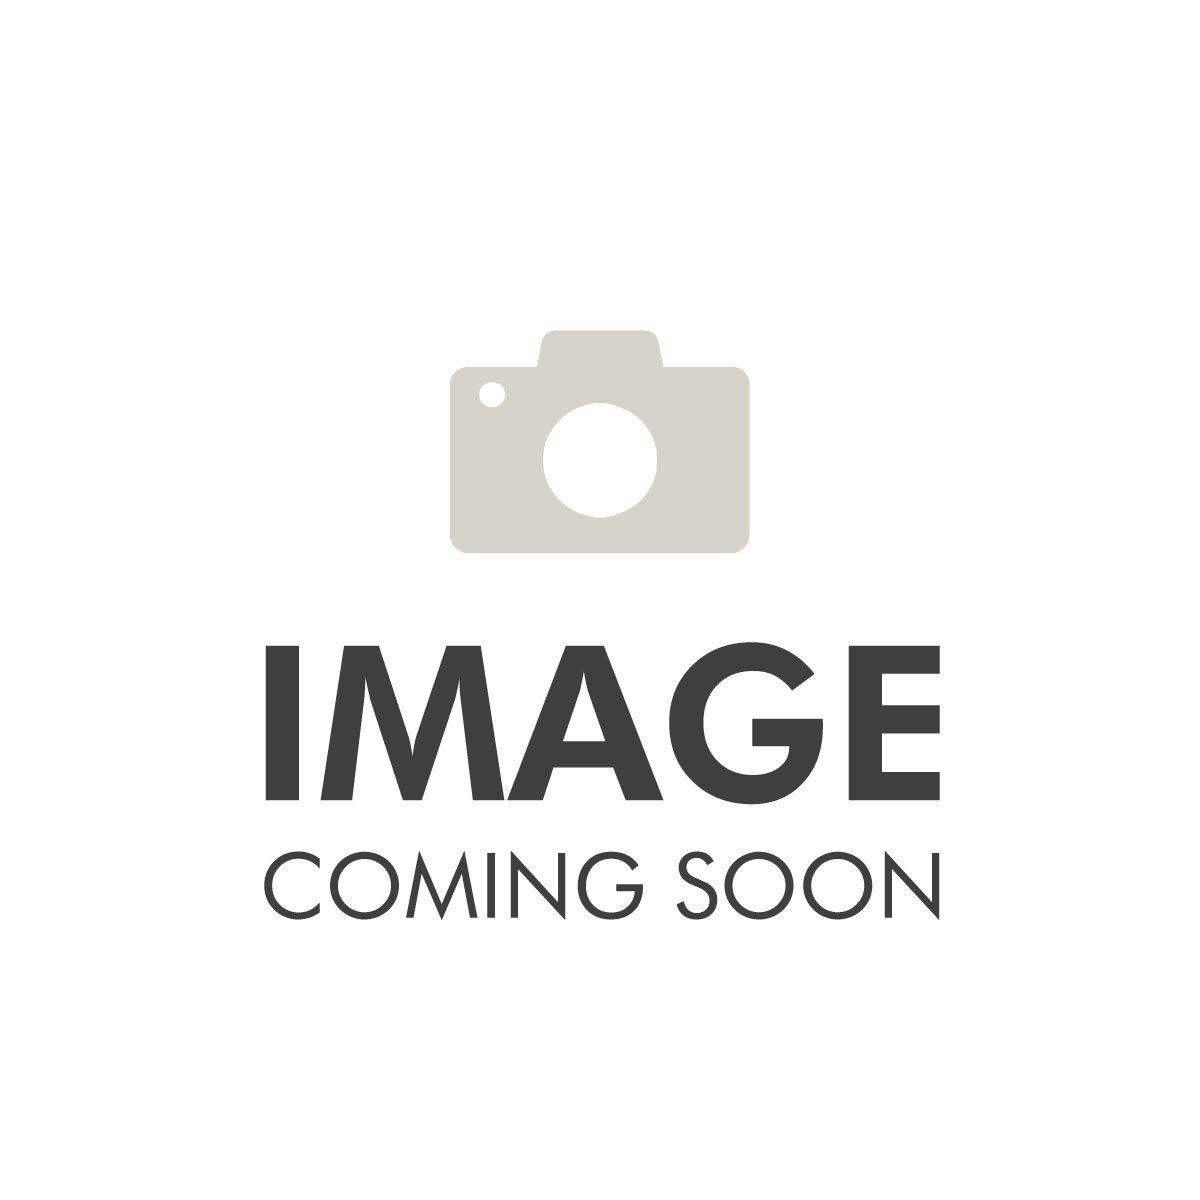 Collistar Magica Bb Absolute Perfection SPF20 2 Mediu Deep 1.5ml